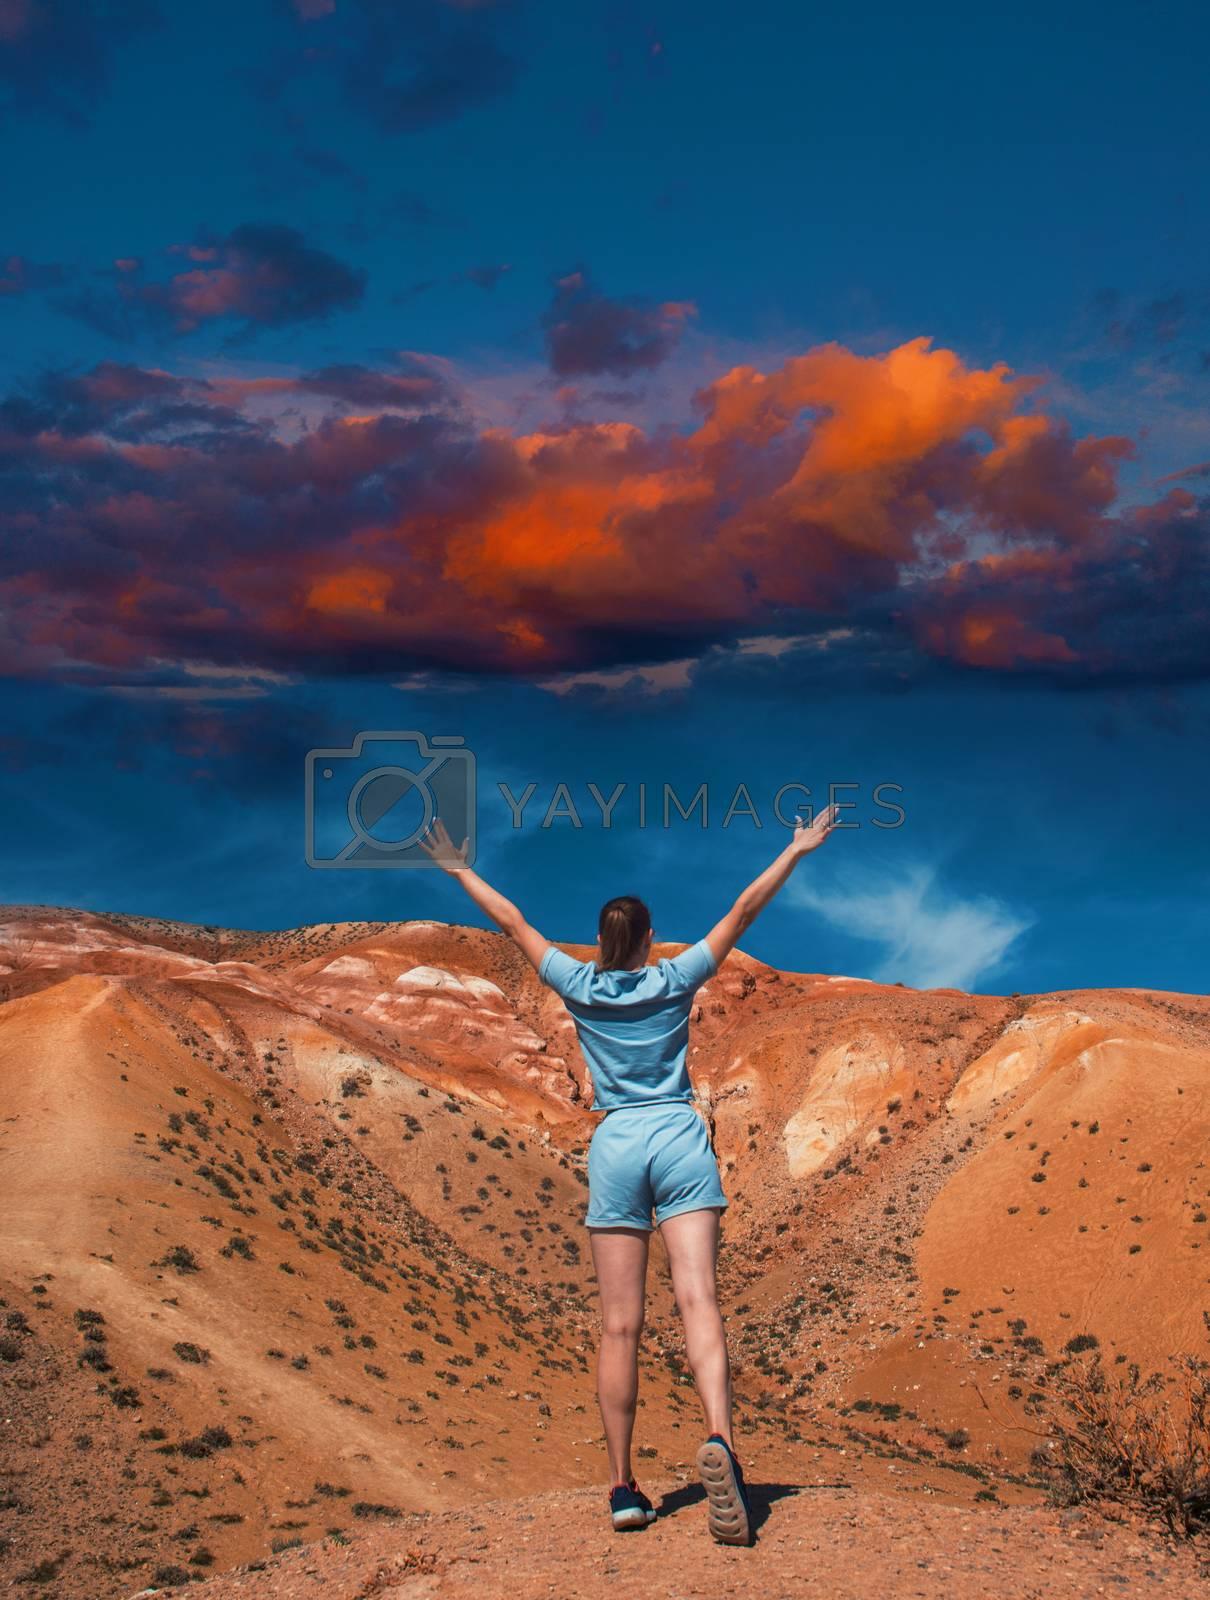 Woman on mars landscape with beauty sky sunset